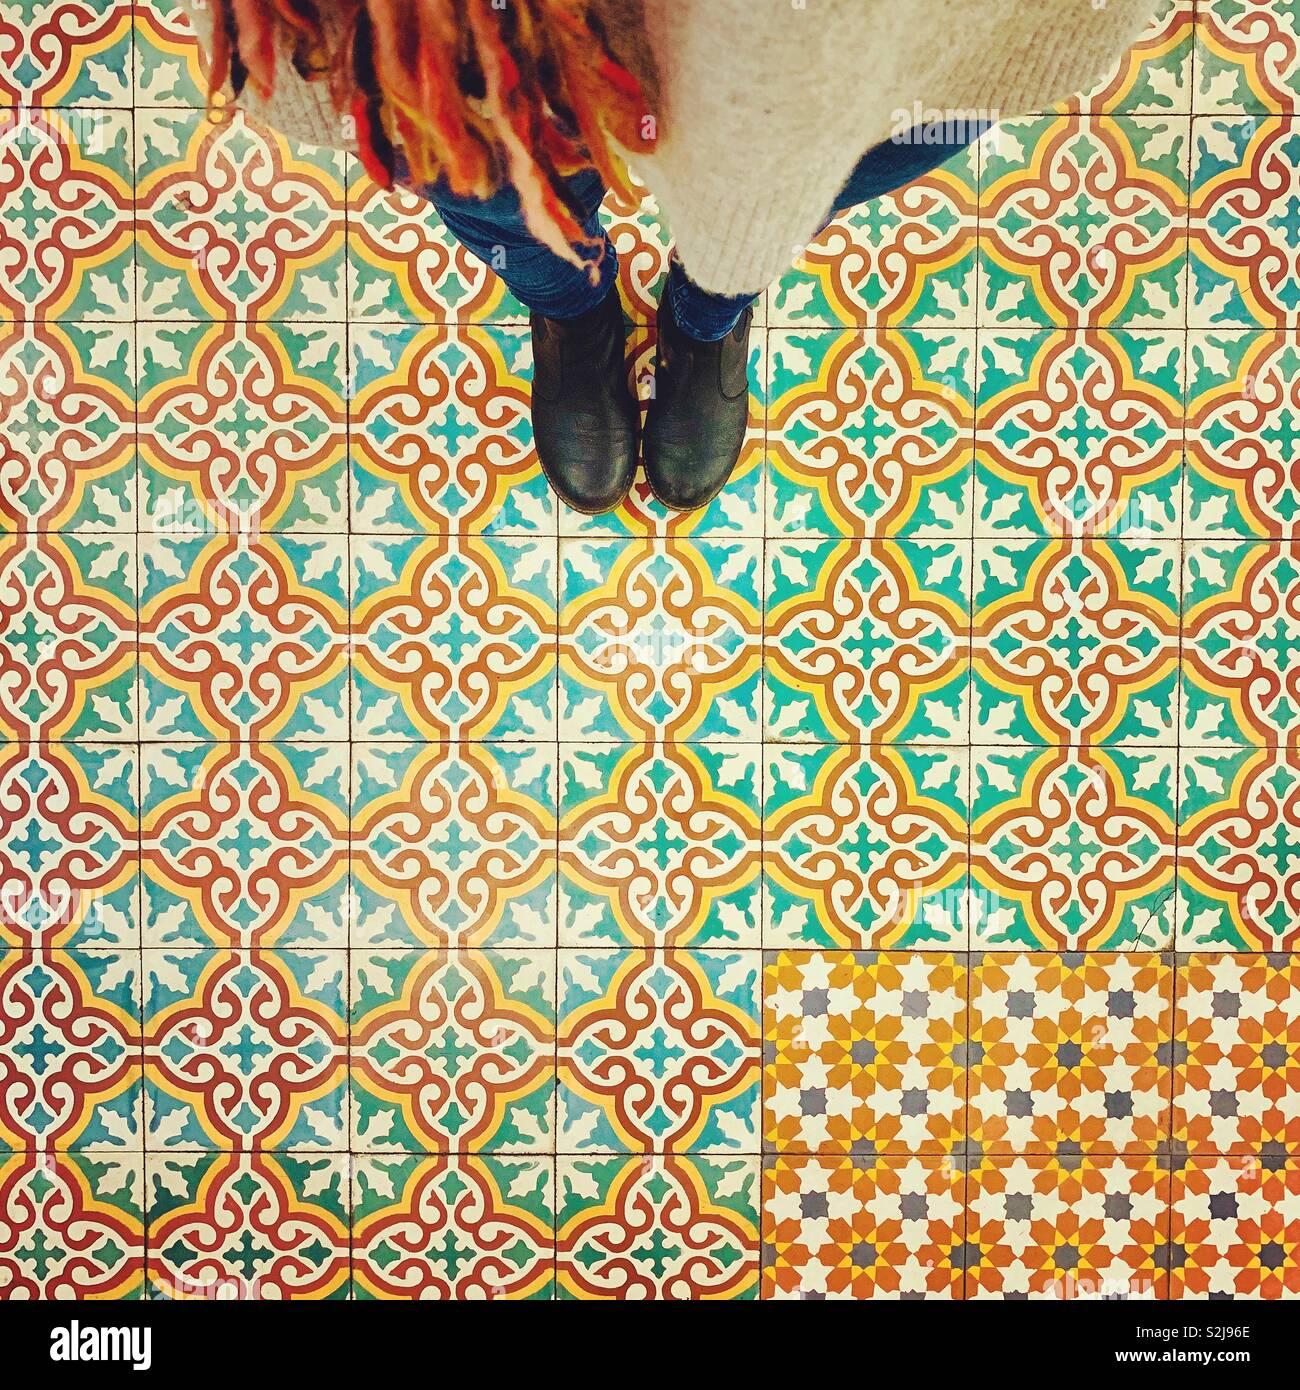 Piastrelle per pavimento in Comptoir Libanais Immagini Stock